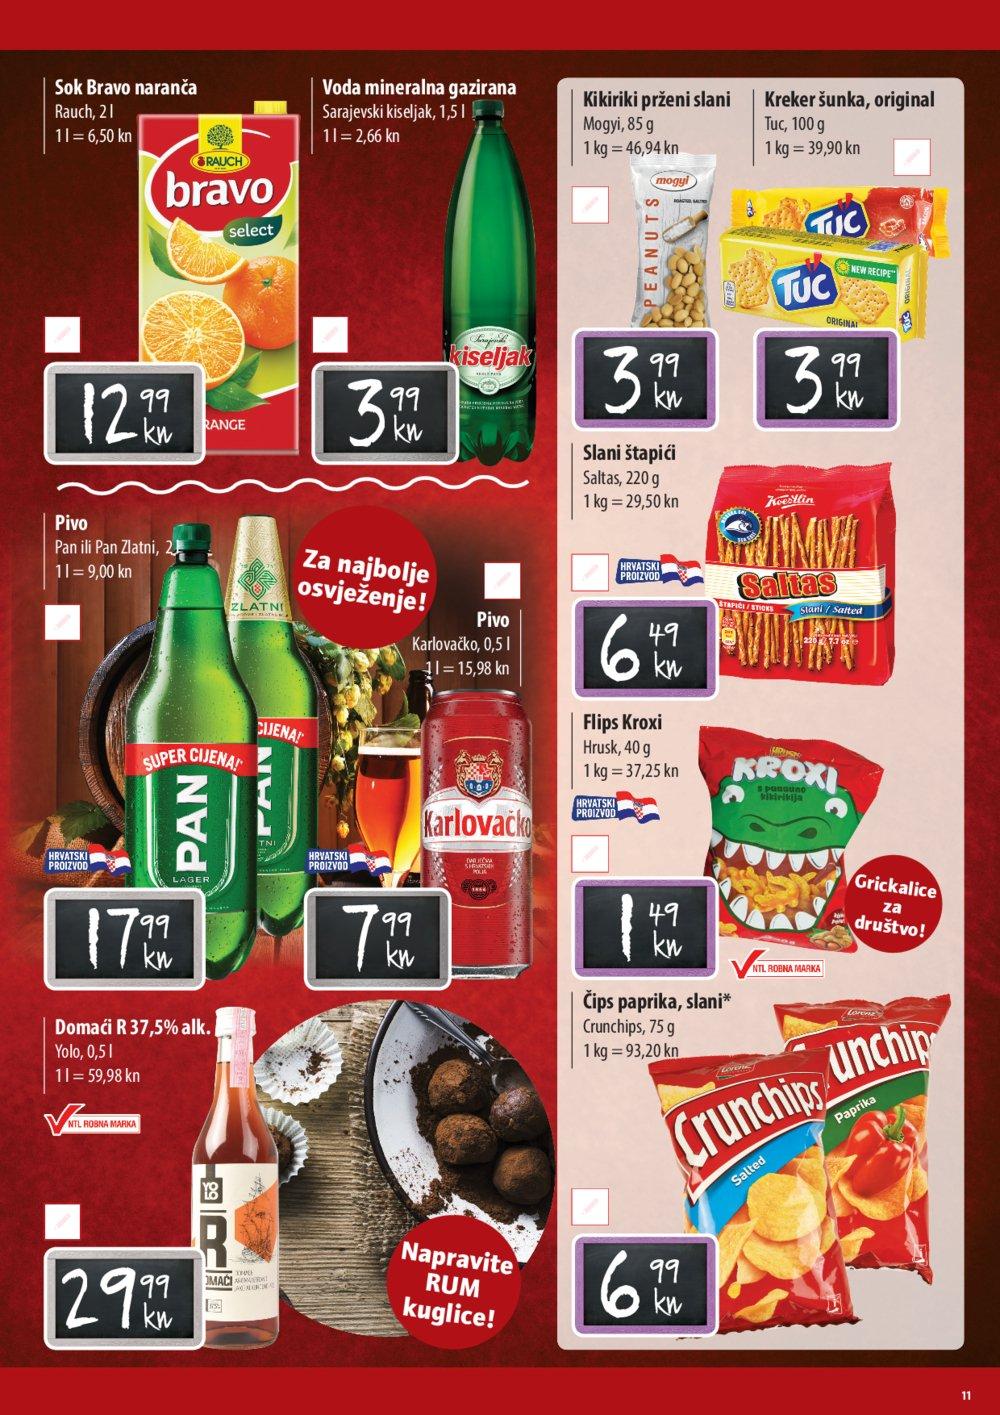 Boso katalog NTL Maxi Tjedna ponuda 24.09.-30.09.2020.